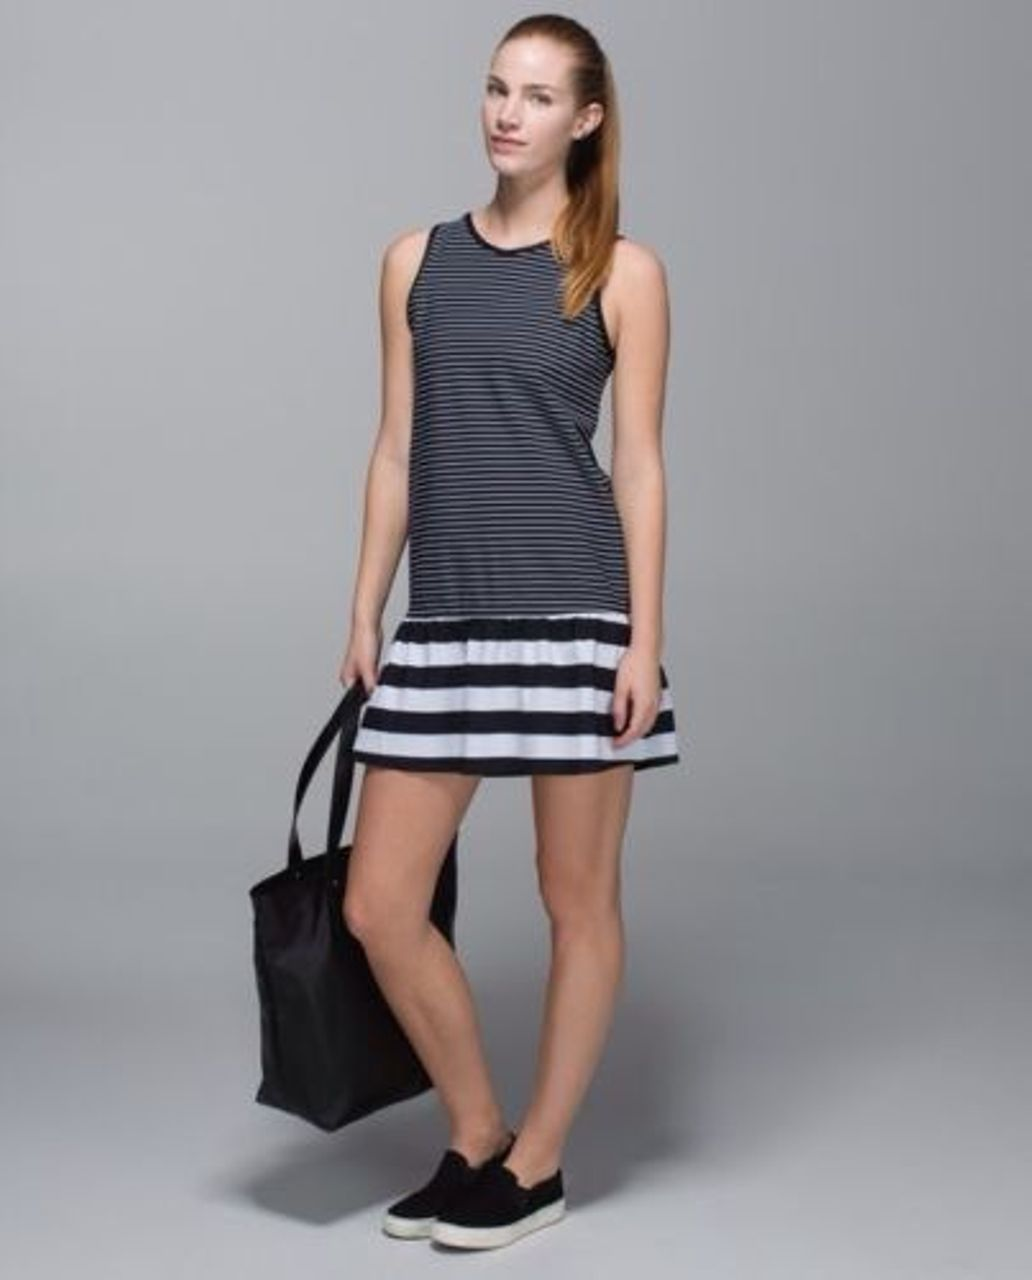 Lululemon Both Ways Dress - Parallel Stripe / Black